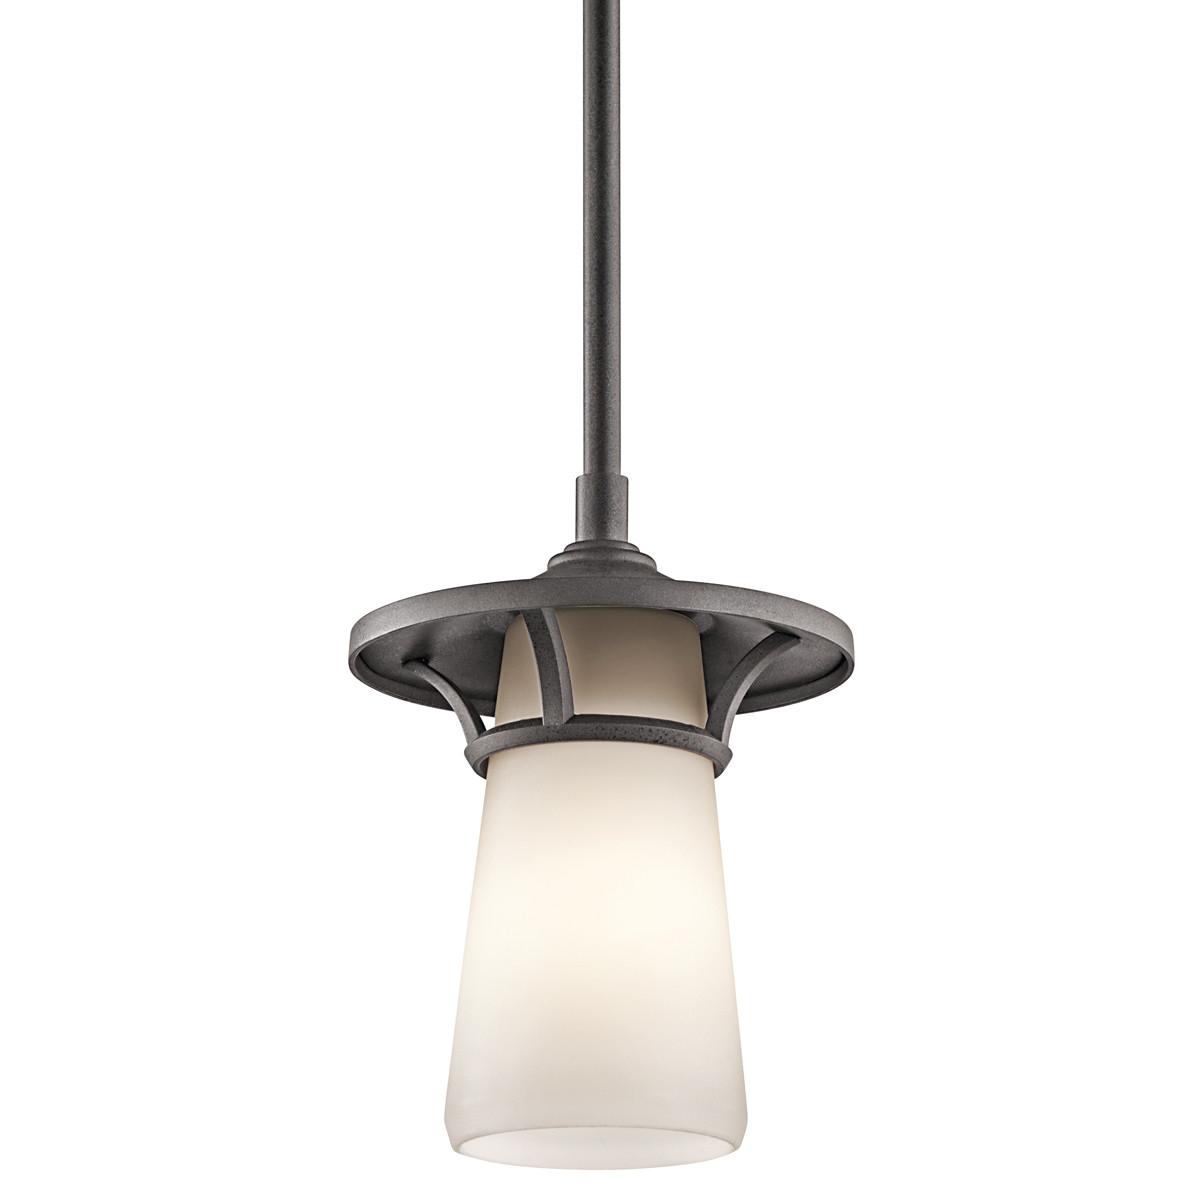 Kichler Lura 1 Light Outdoor Pendant L Brilliant Source Lighting